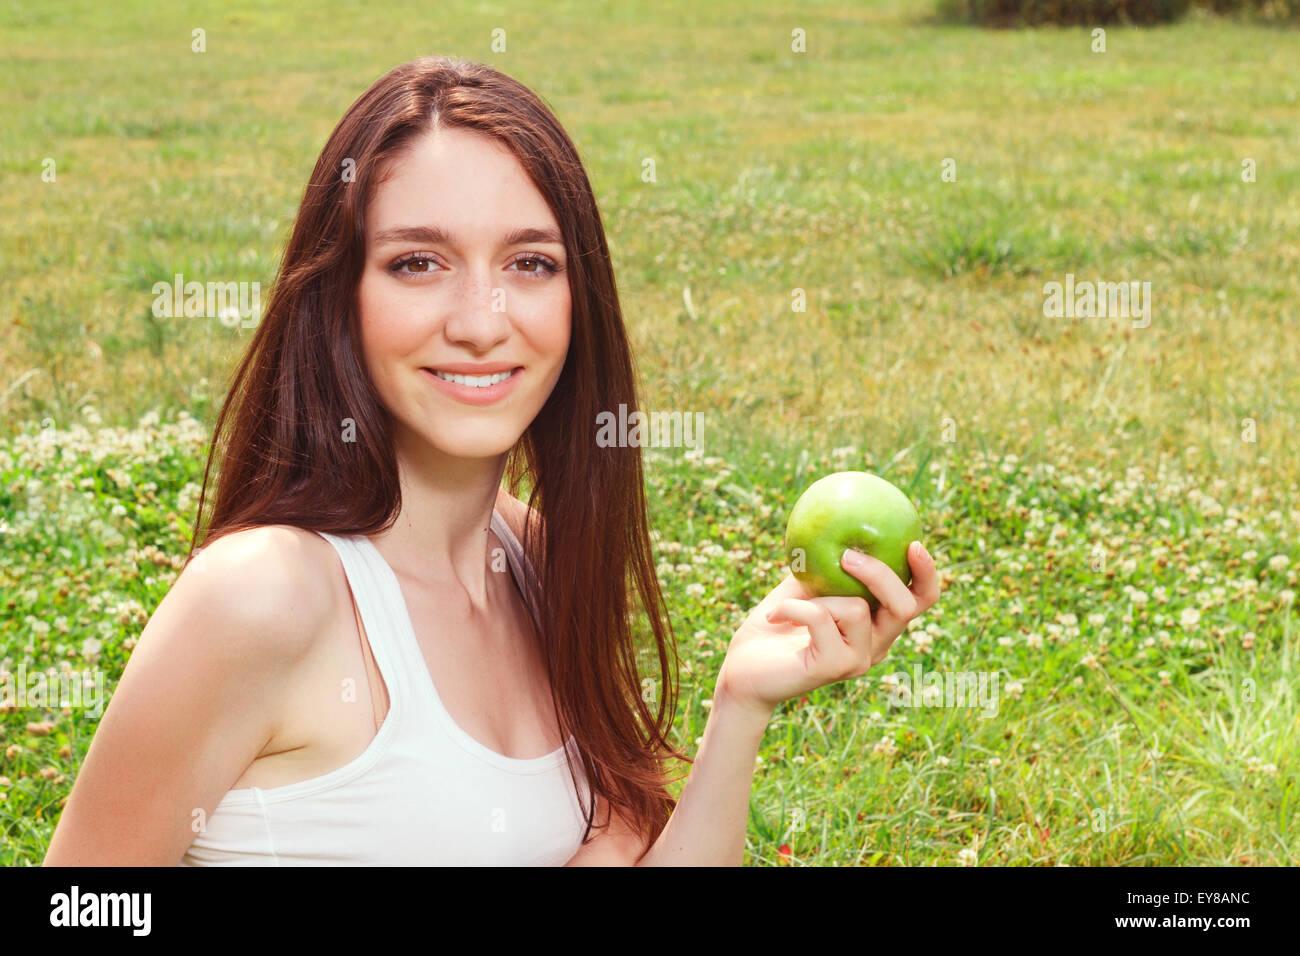 Nice young girl eating apple - Stock Image